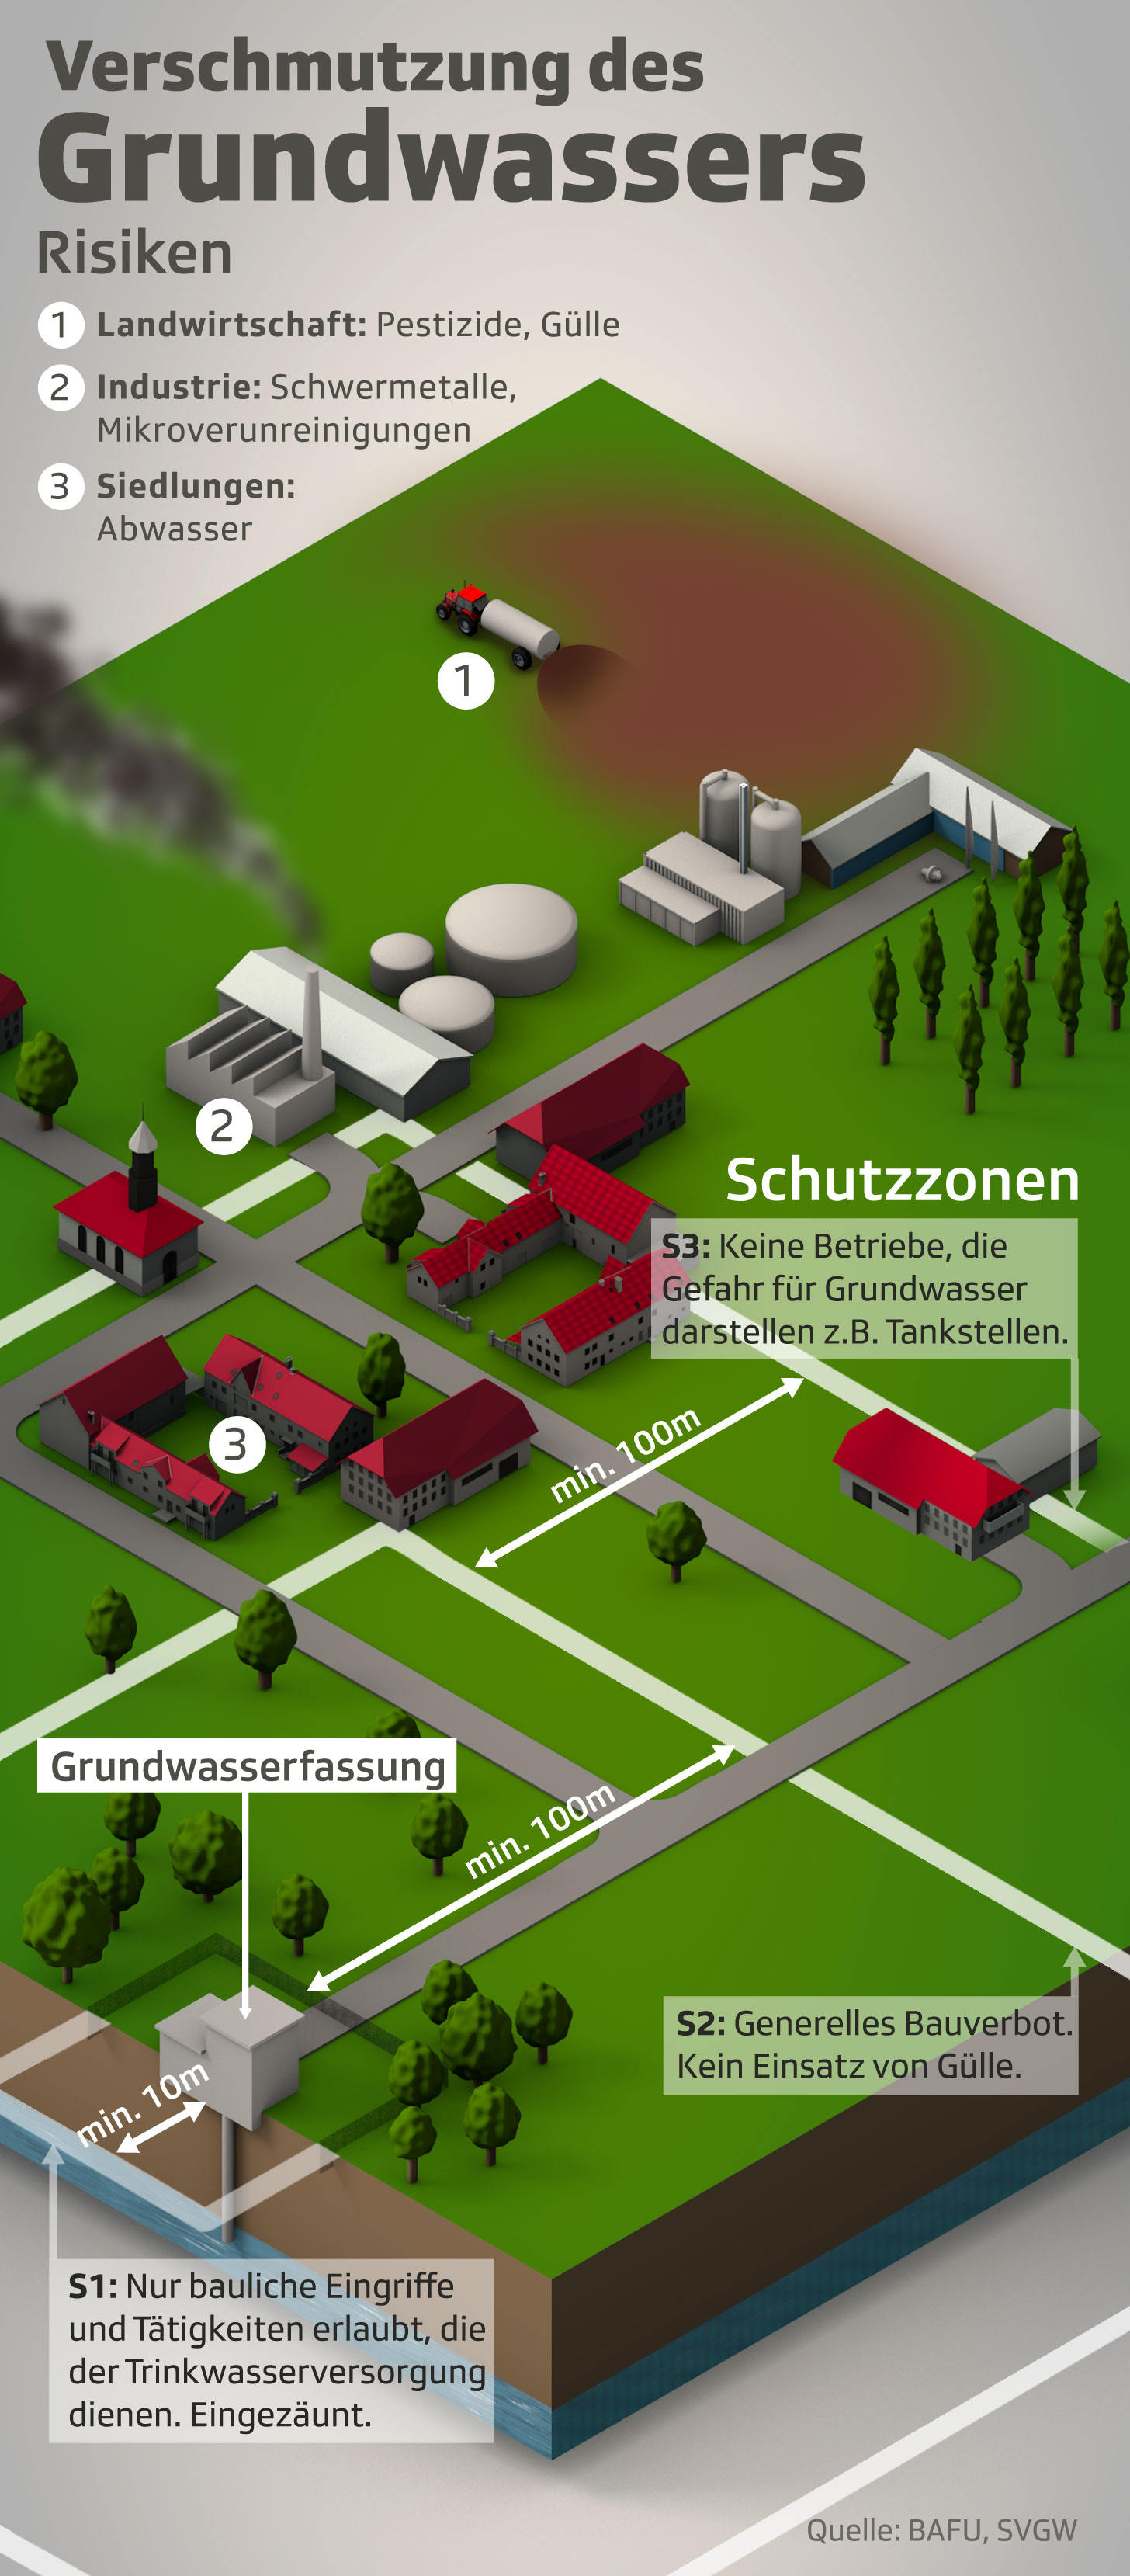 Grundwasserverschmutzung